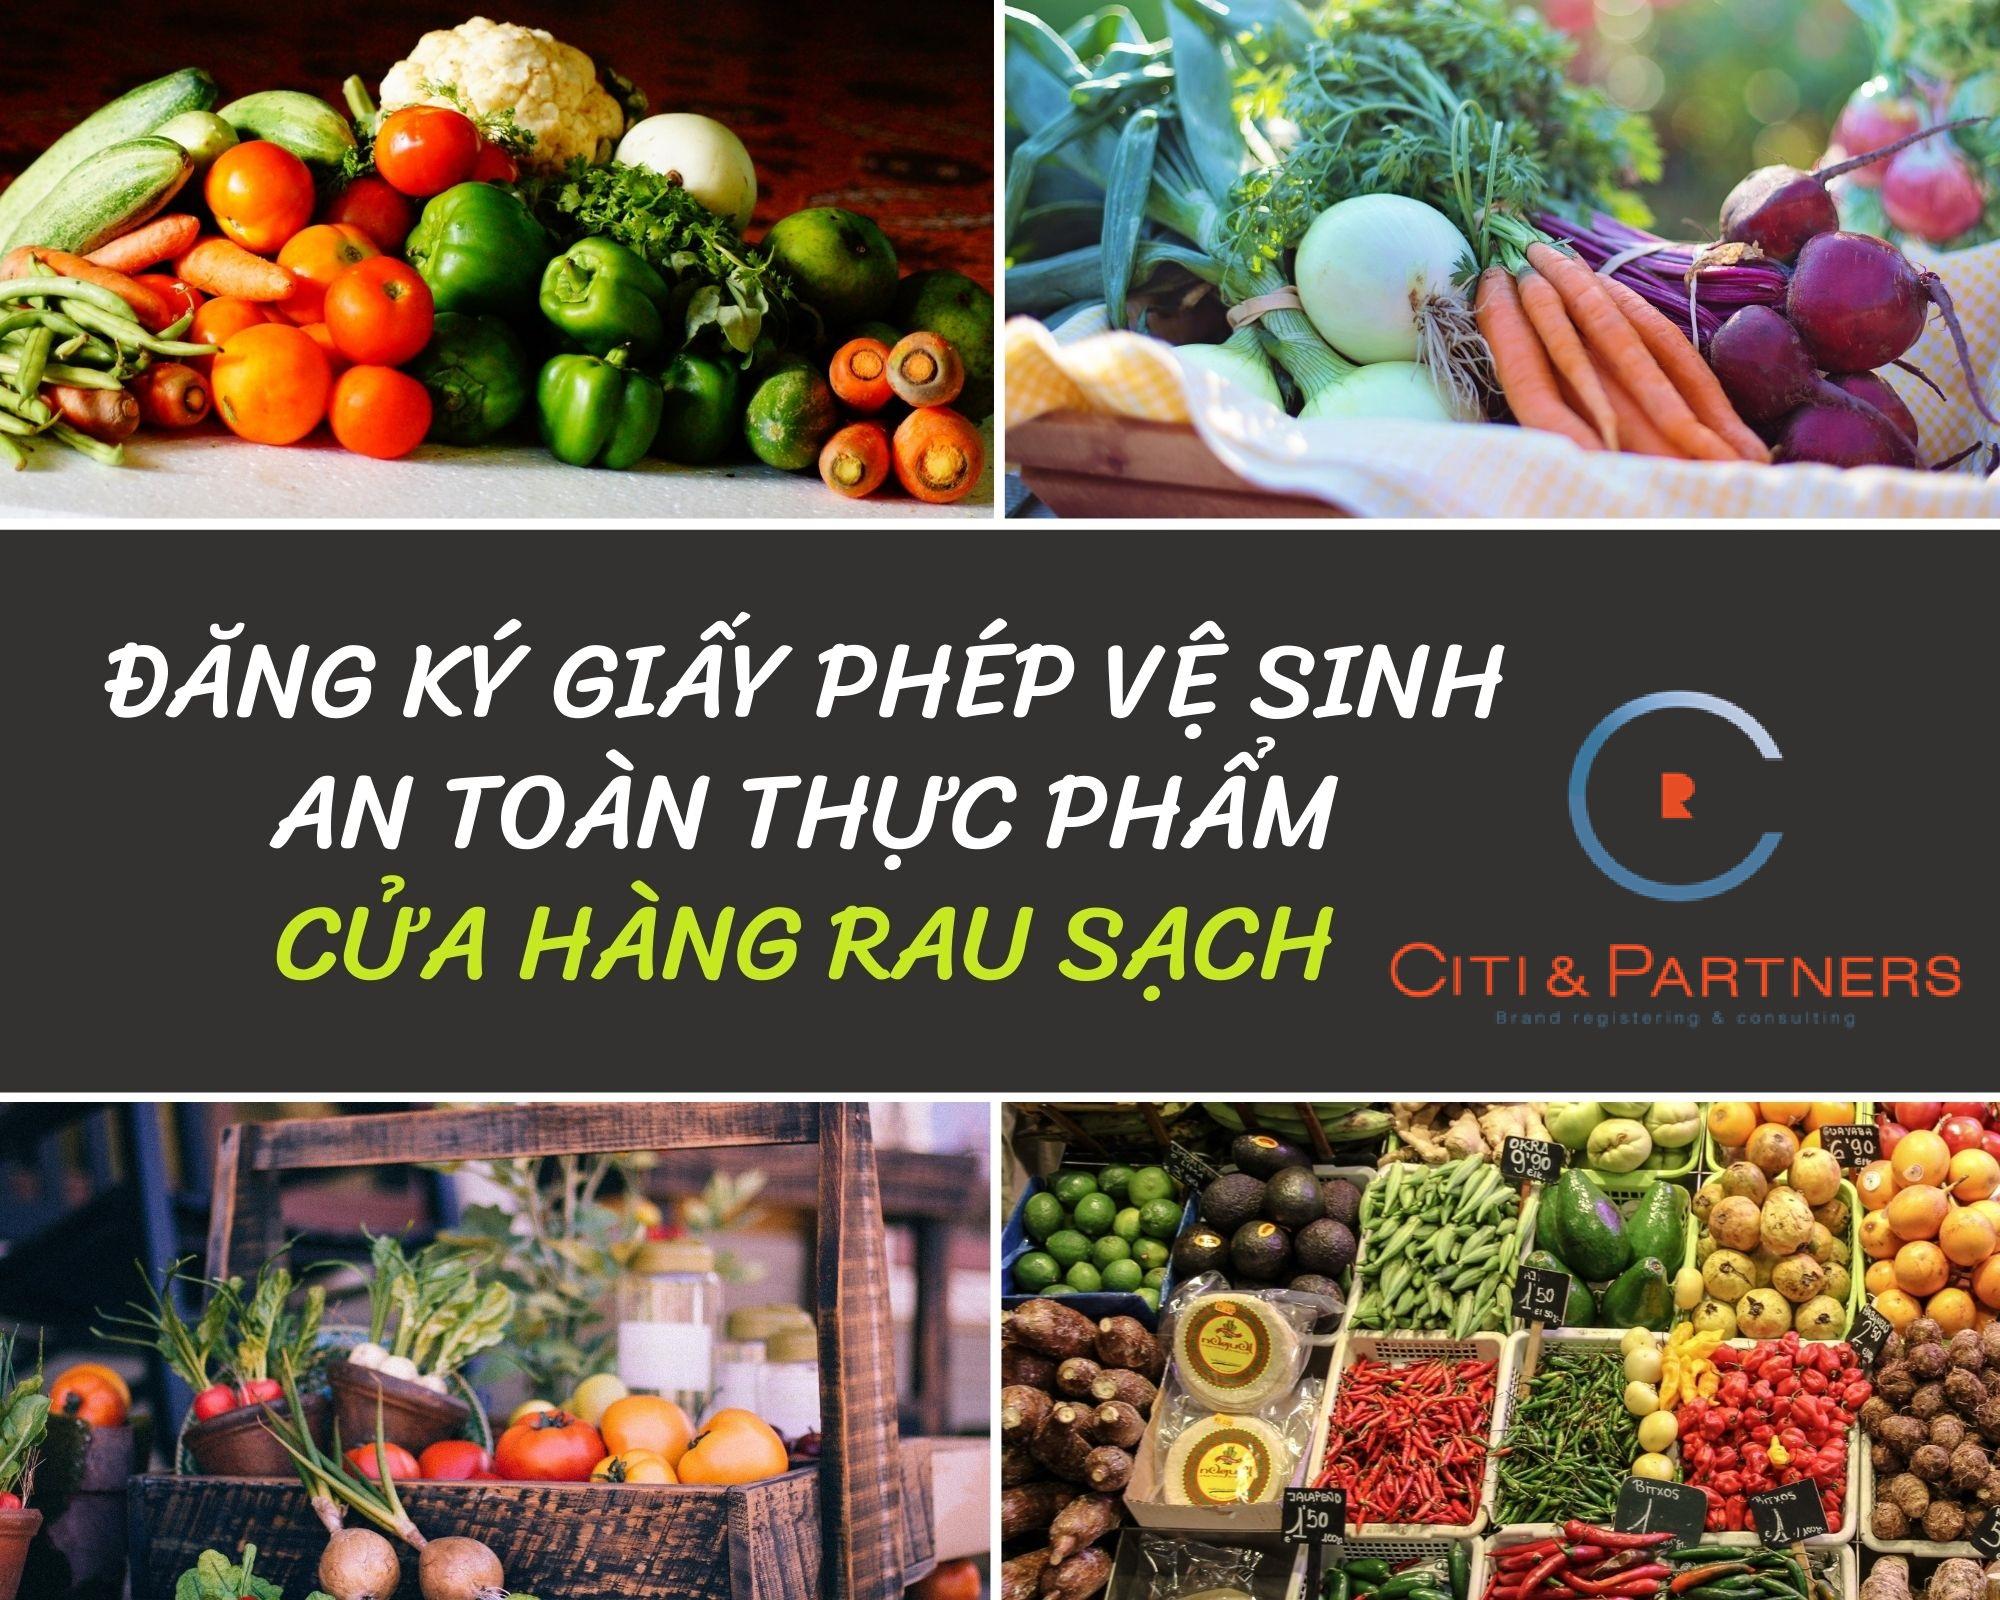 dang-ky-giay-phep-an-toan-thuc-pham-cưa-hang-rau